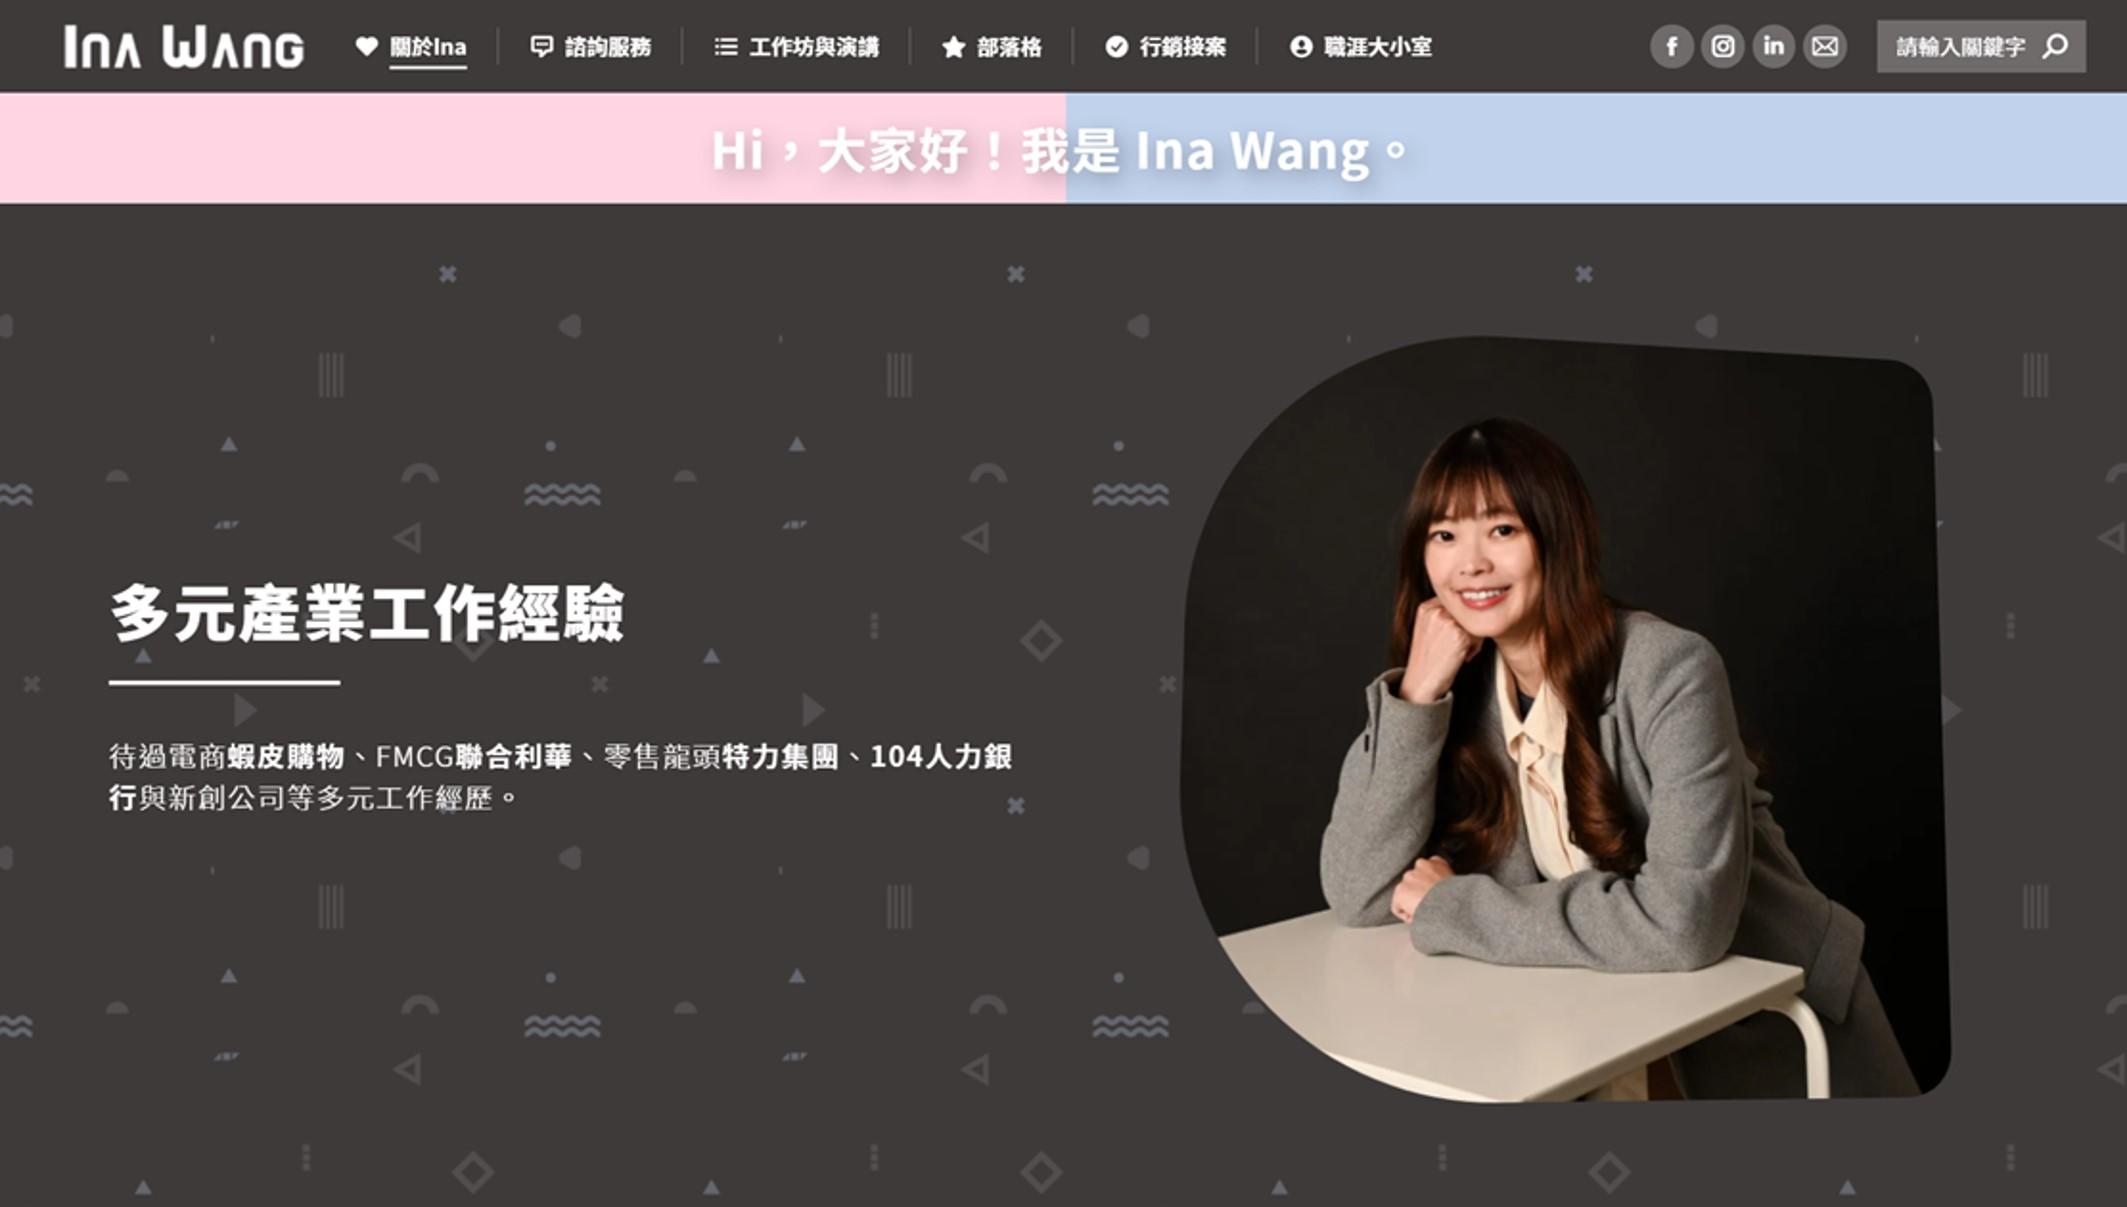 inawang-kol-featured-image